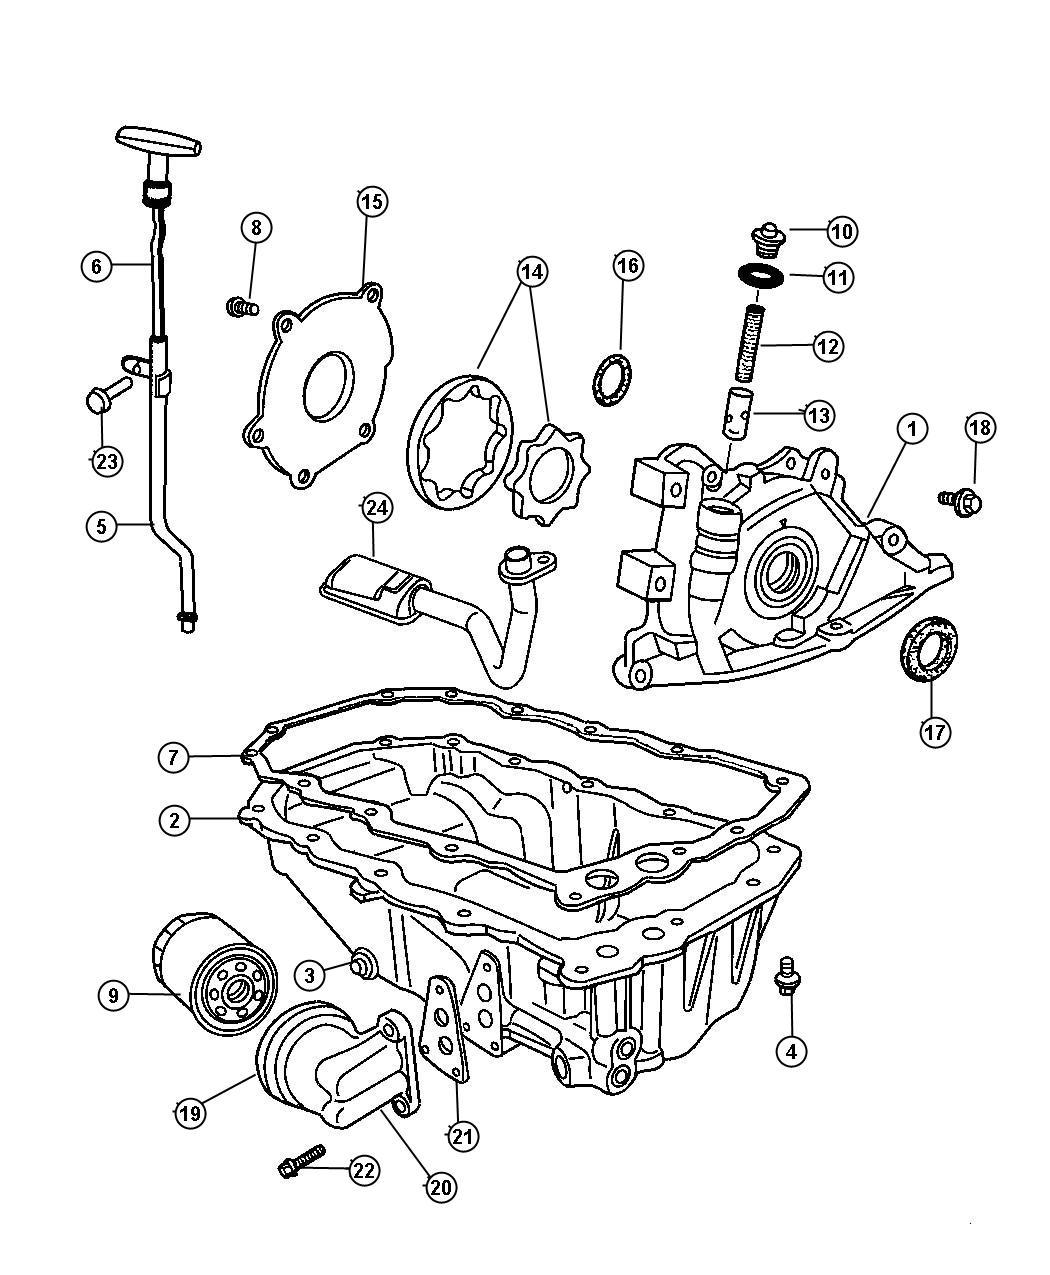 Chrysler Pt Cruiser Gasket Oil Pan Engine Tracking